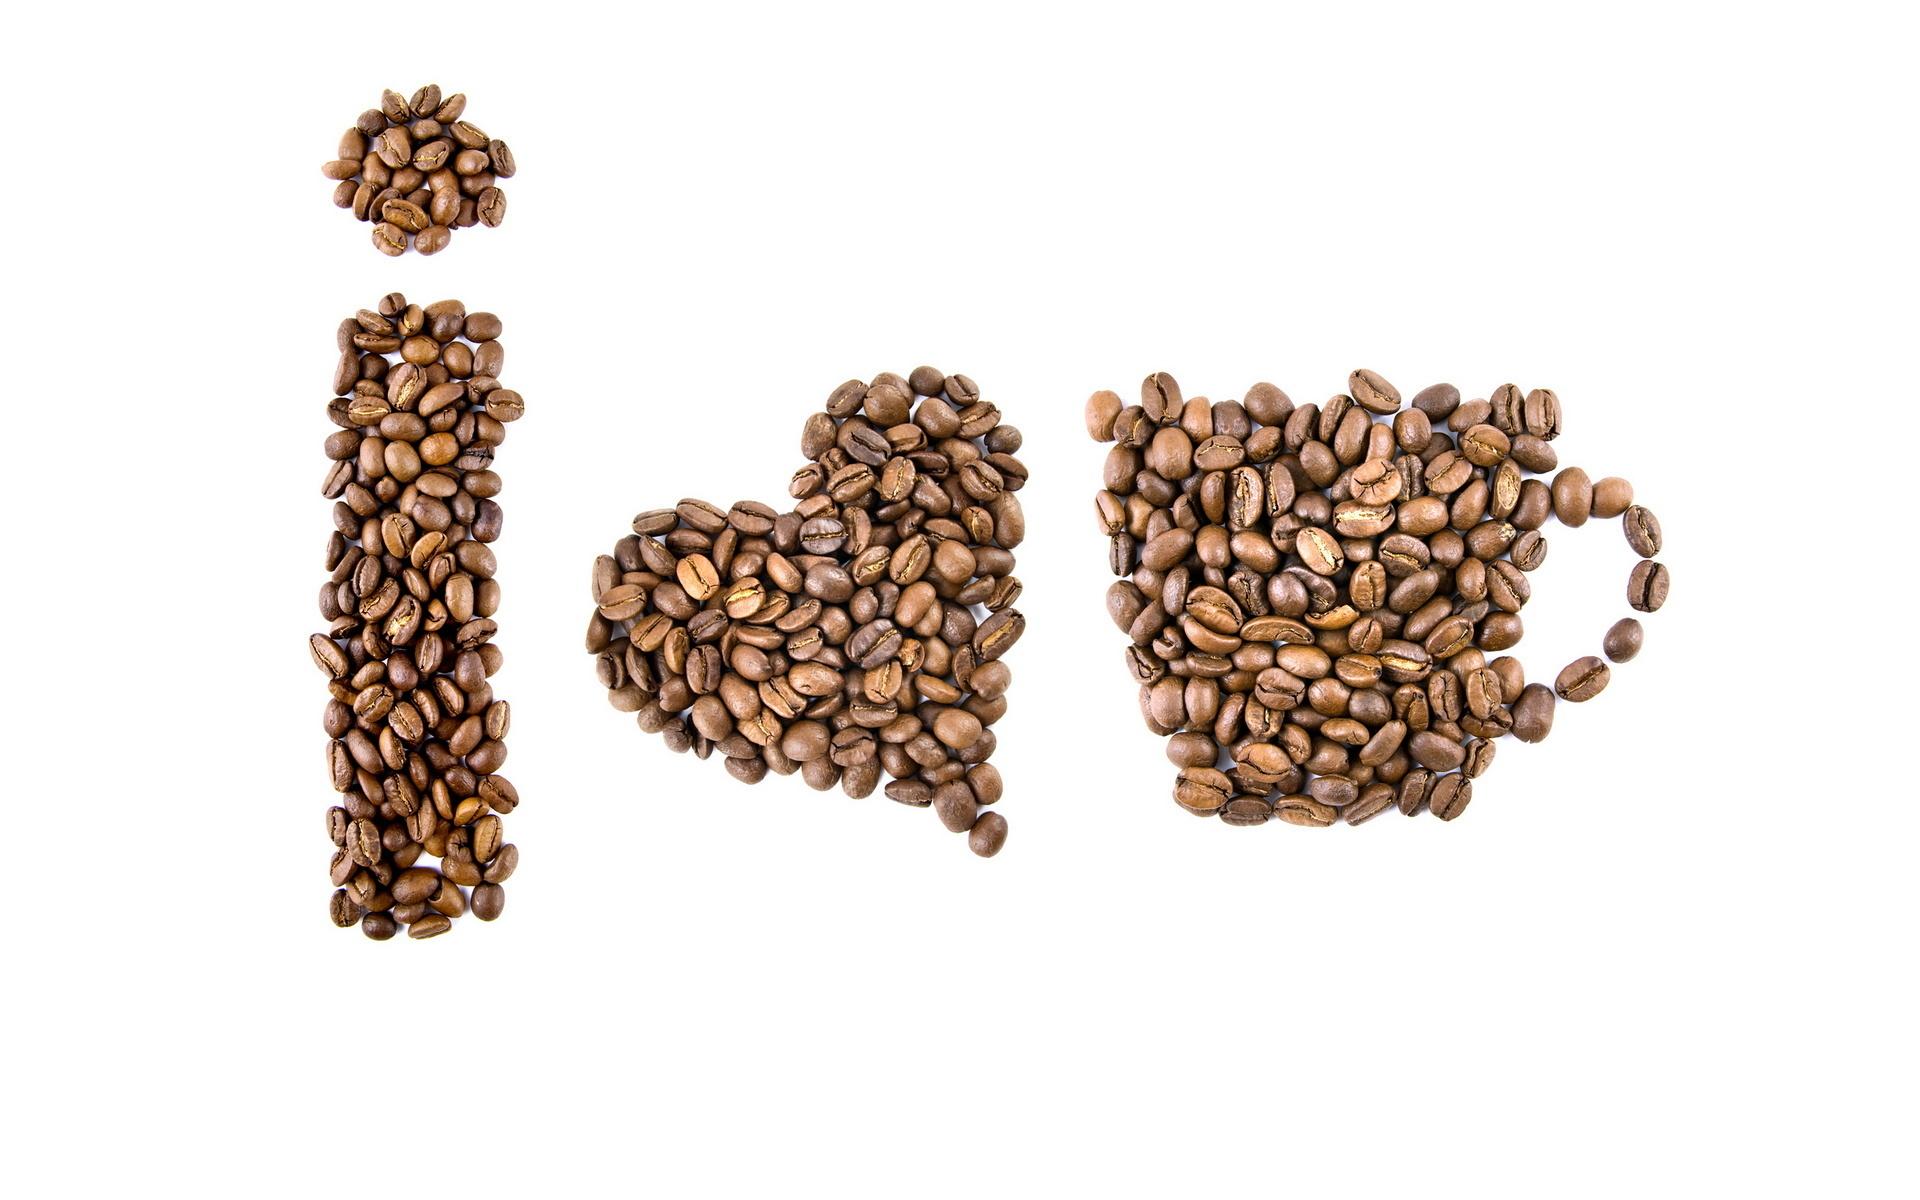 mrmrsmuscle_breakfast_coffee